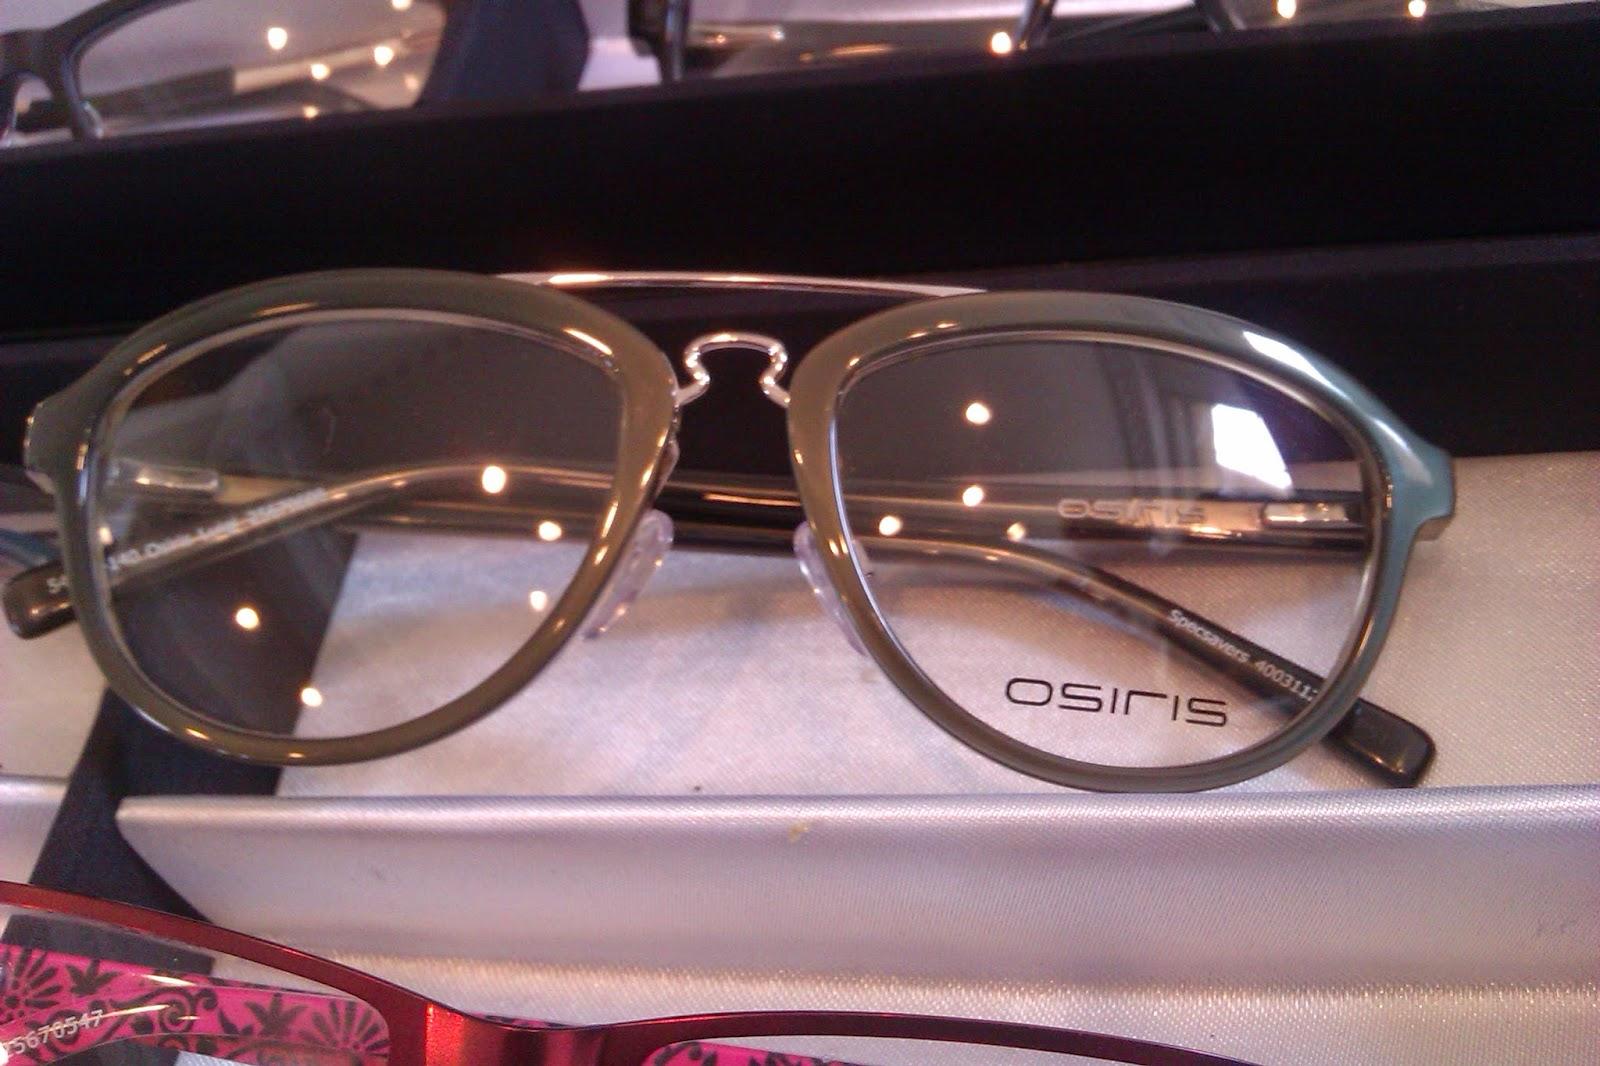 c7ccd81e7ceb Danish fashion designer Jorgen Simonsen collaborates with Osiris eyewear.